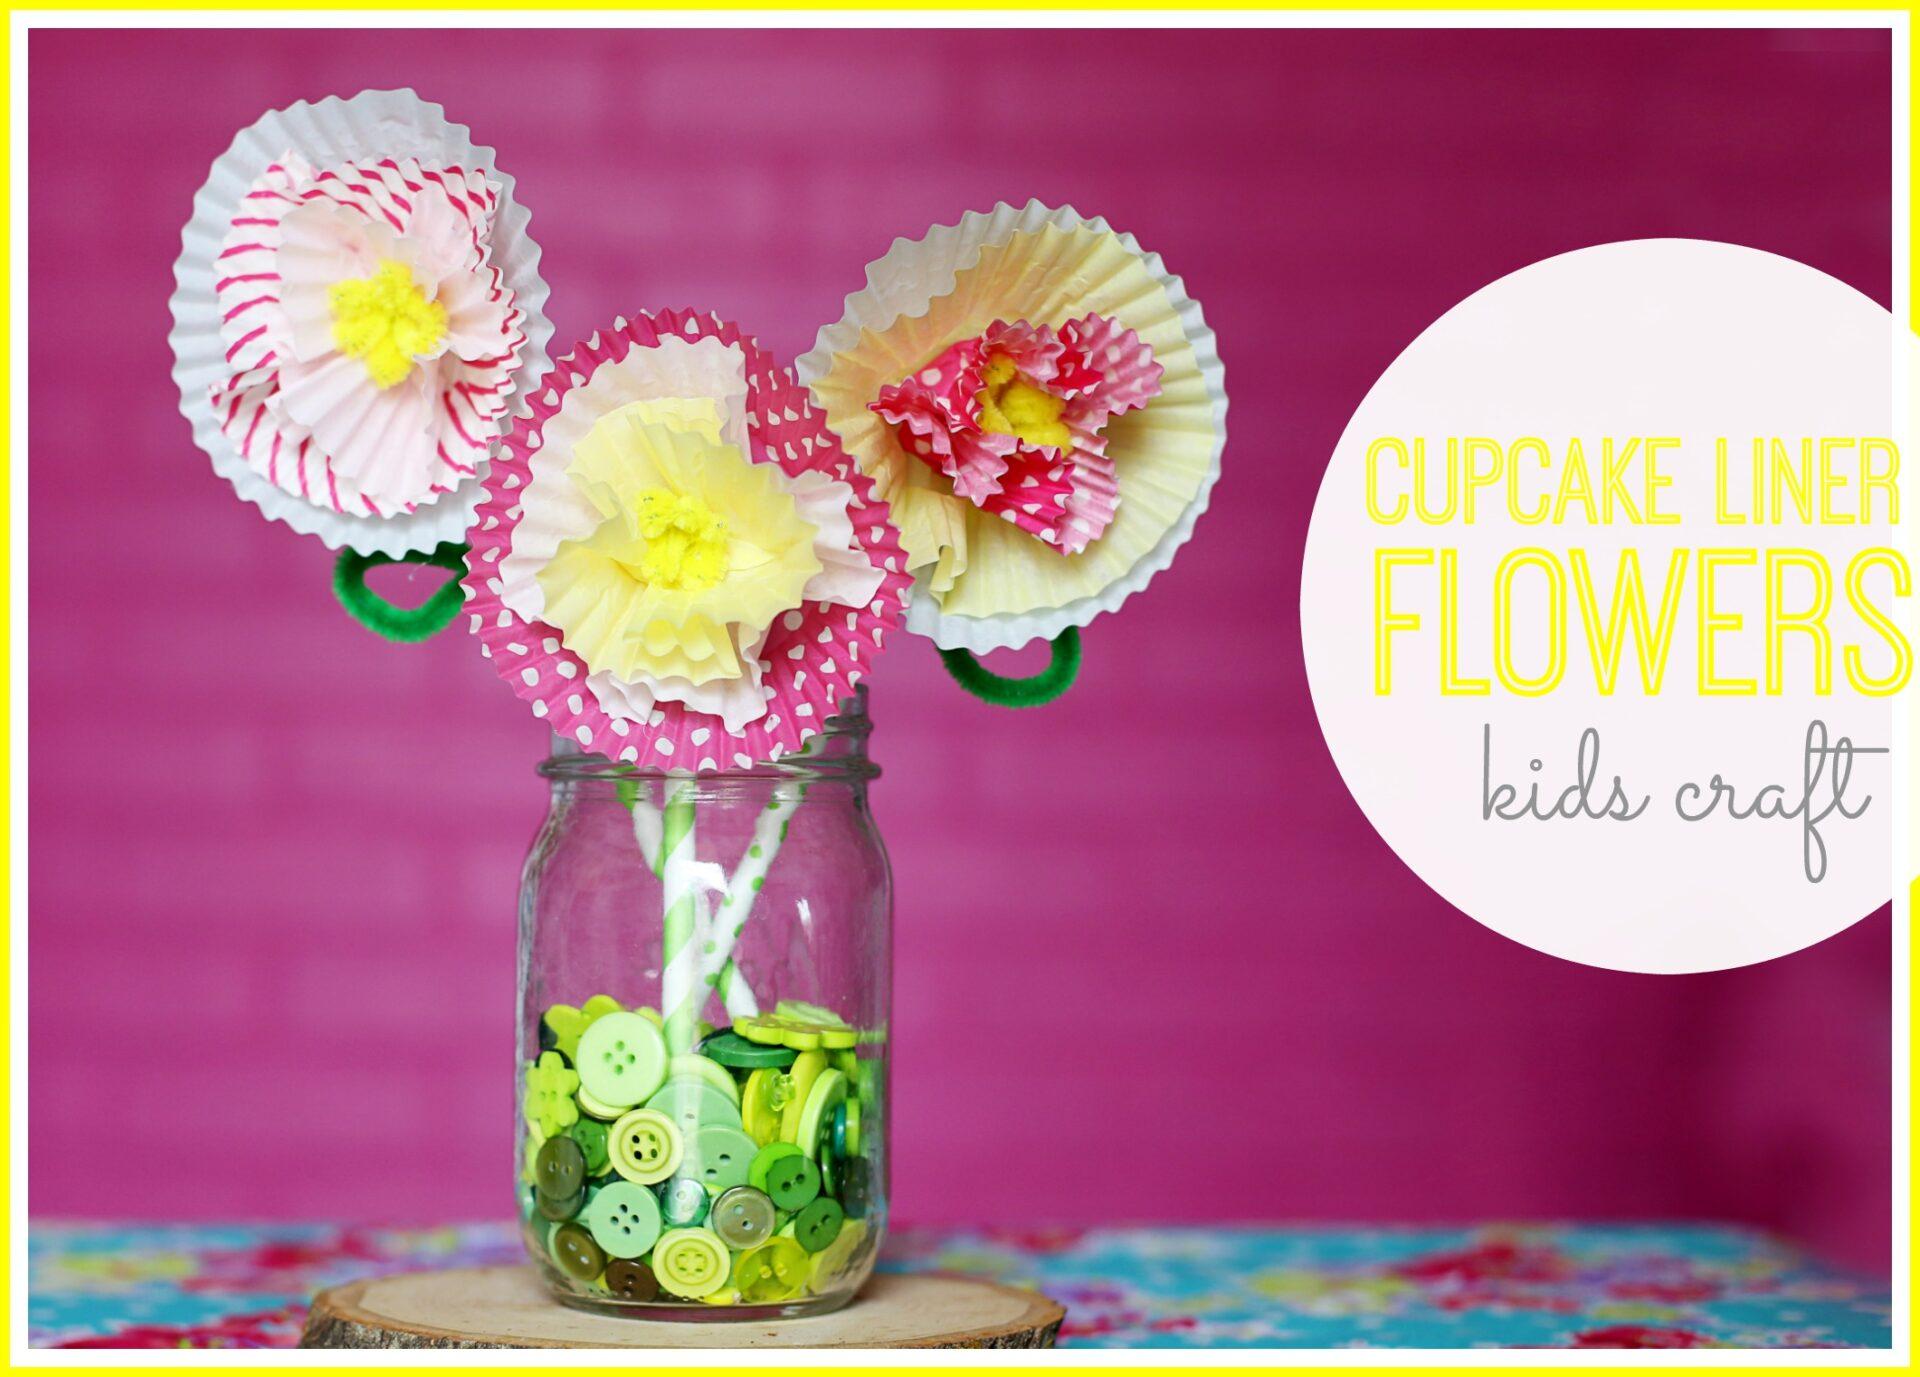 Cupcake liners flowers 2 minute diy youtube.